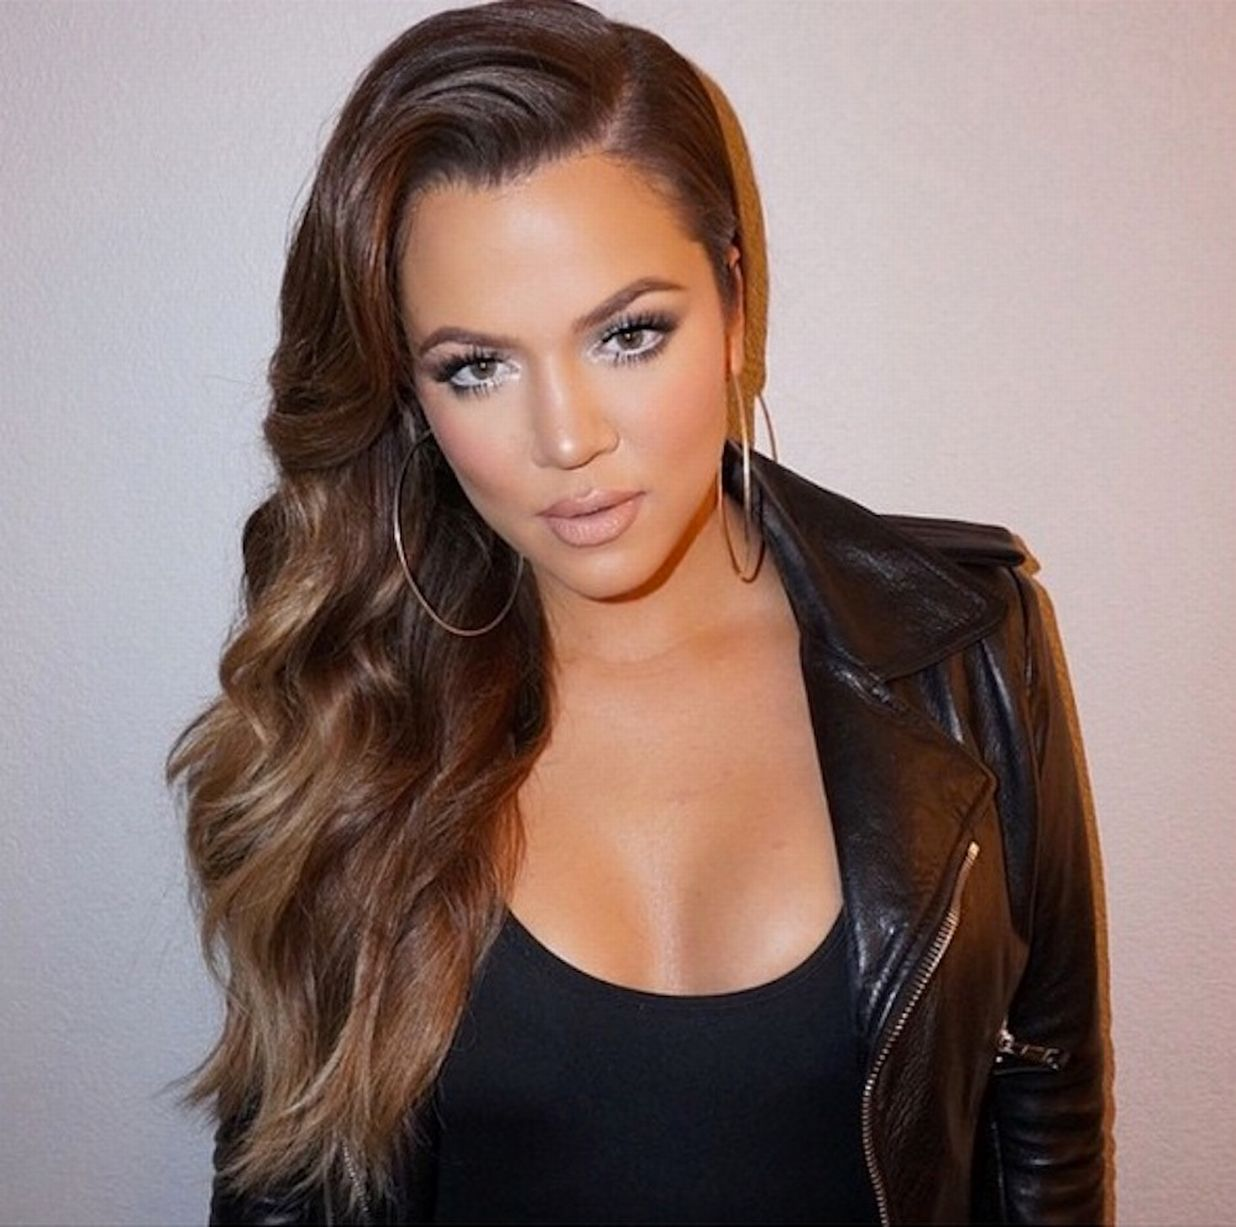 Khloe Kardashian Announces The New KKW Fragrance Diamonds Collection With Kim & Kourtney - Fans Adore Khloe's Brunette Hair